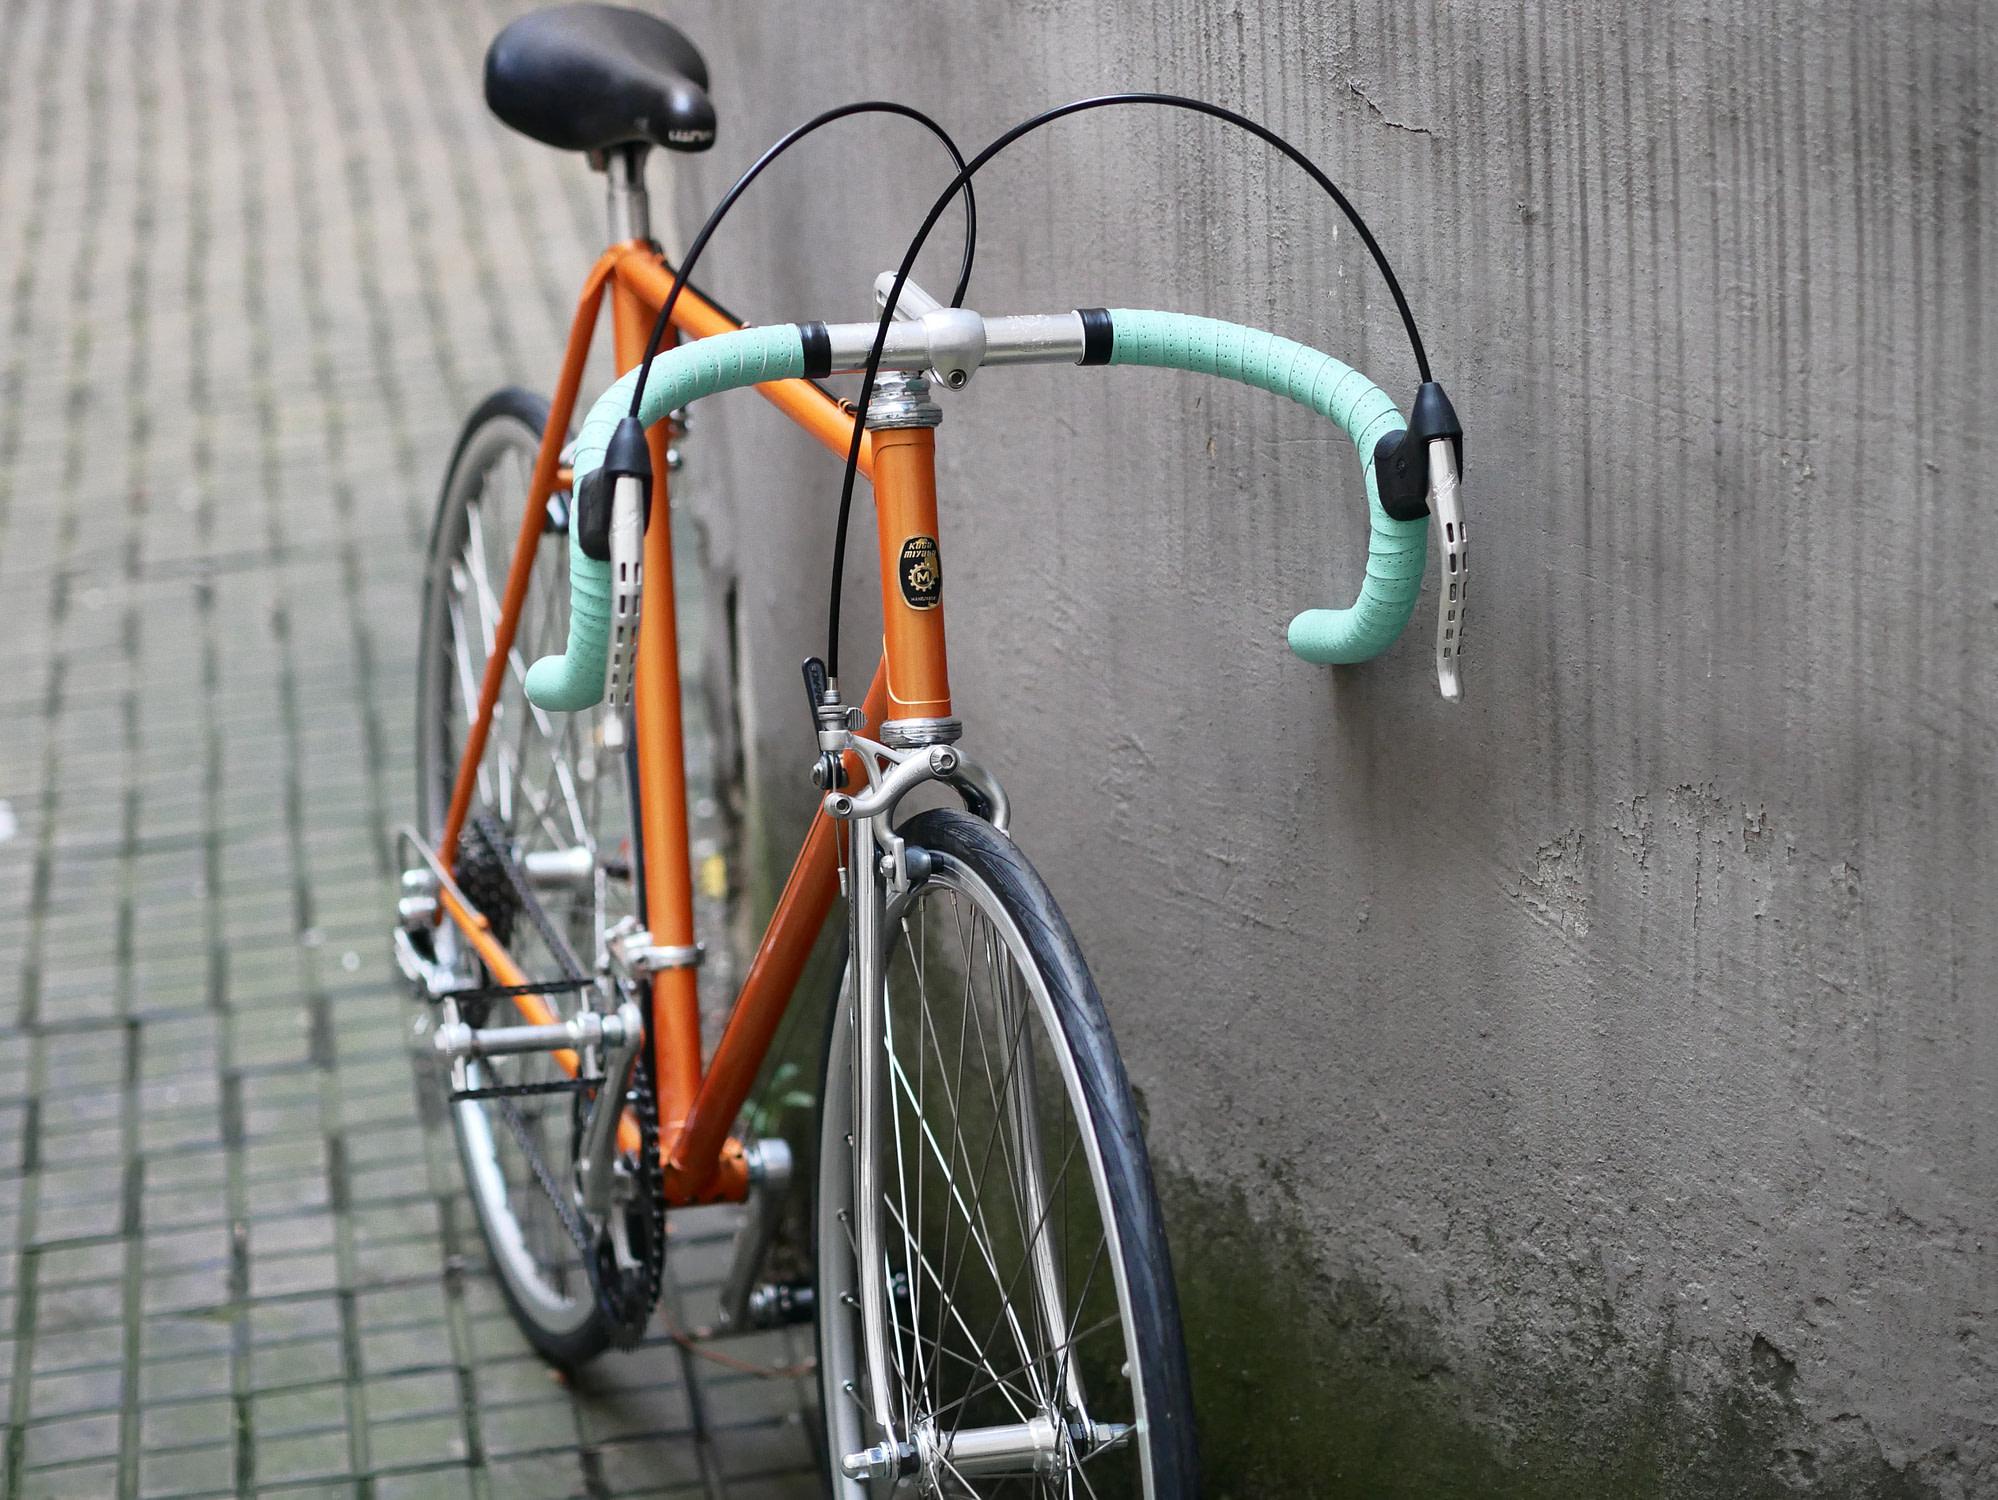 P1140020 scaled - Koga Miata - Orange